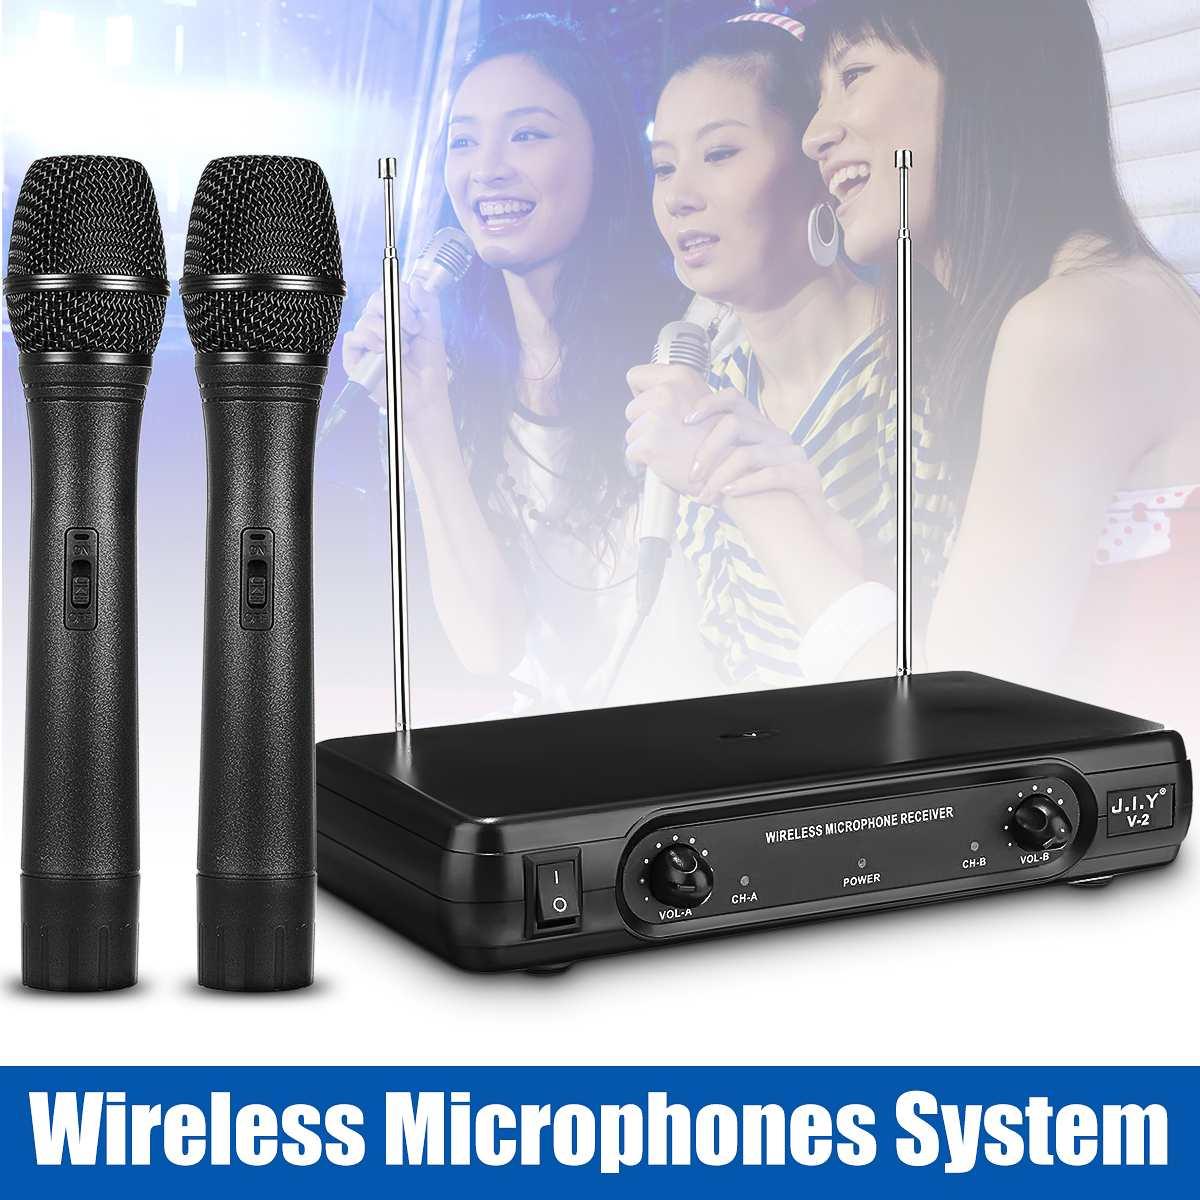 Sistema sem Fio Vhf sem Fio Karaoke com 2 Duplo Profissional Microfone Handheld Receptor Microfones Mod. 1418239